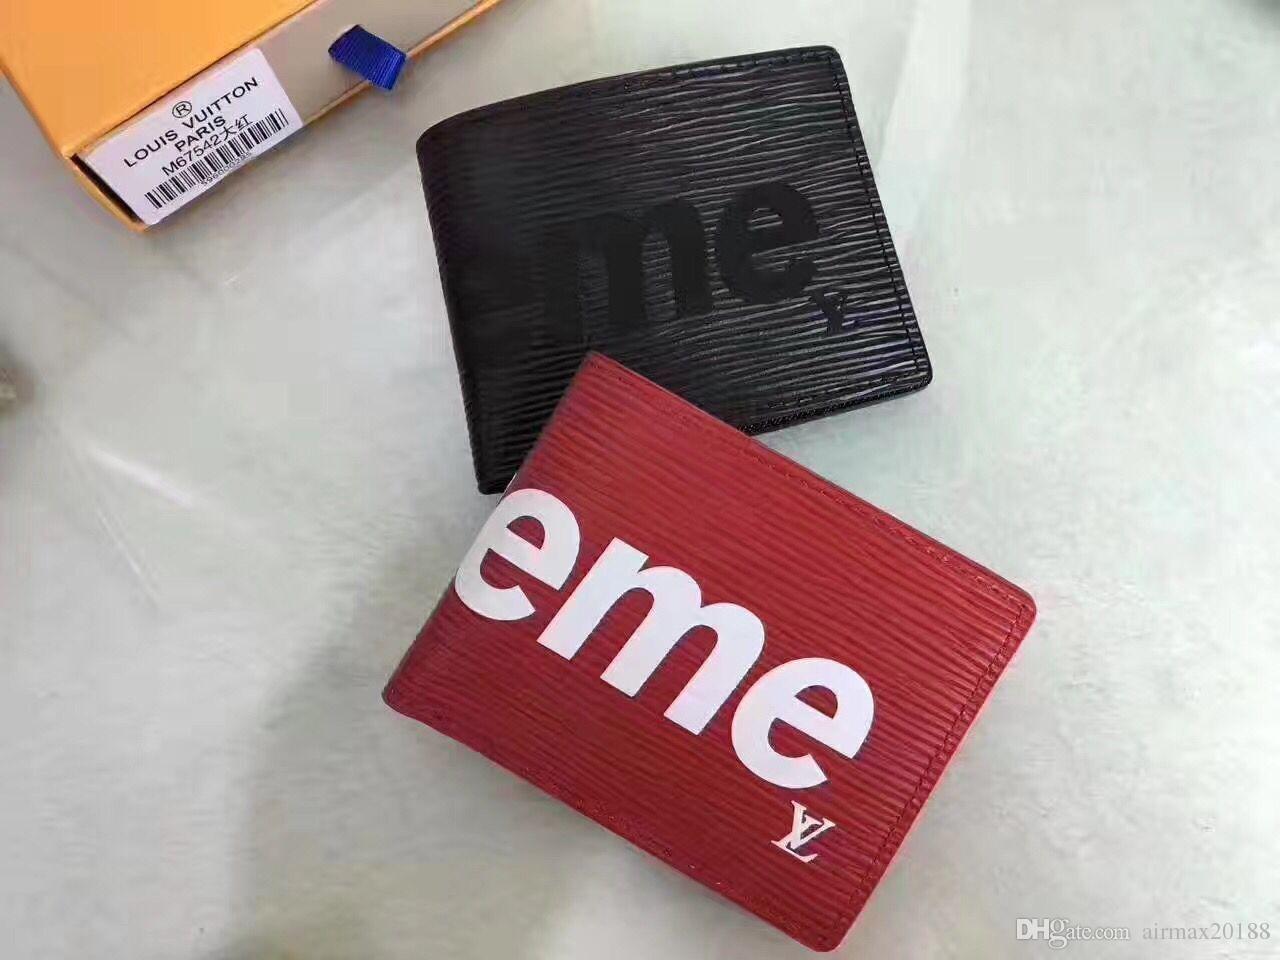 7e63e98c43aa97 LOUIS VUITTON X SUPREME Red Leather Wallet Women And Men Handbags Top  Quality Purse Brand Designer Card Holder Portefeuille Homme Tote LV Purses  Designer ...